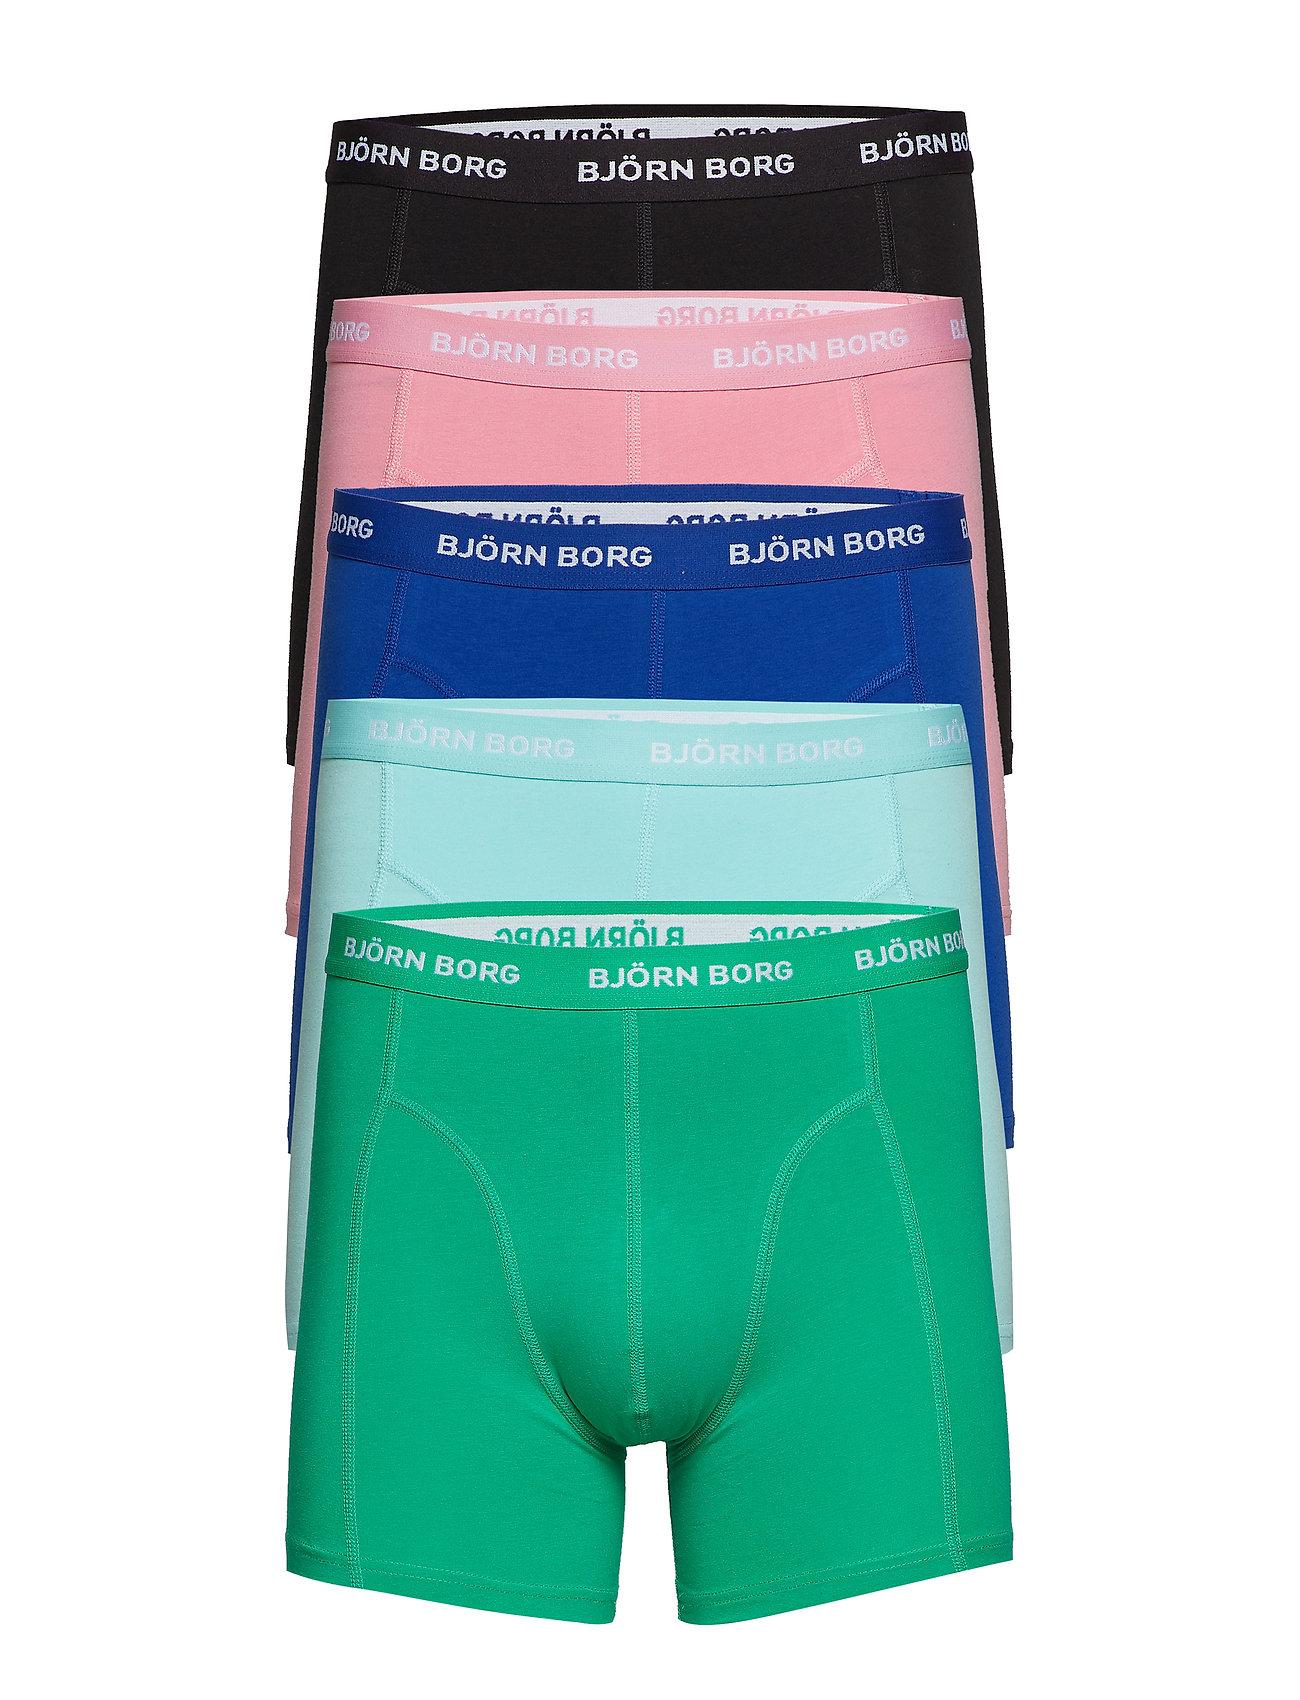 Borg Shorts Solid Seasonal 5psachet PinkBjörn jL5A4R